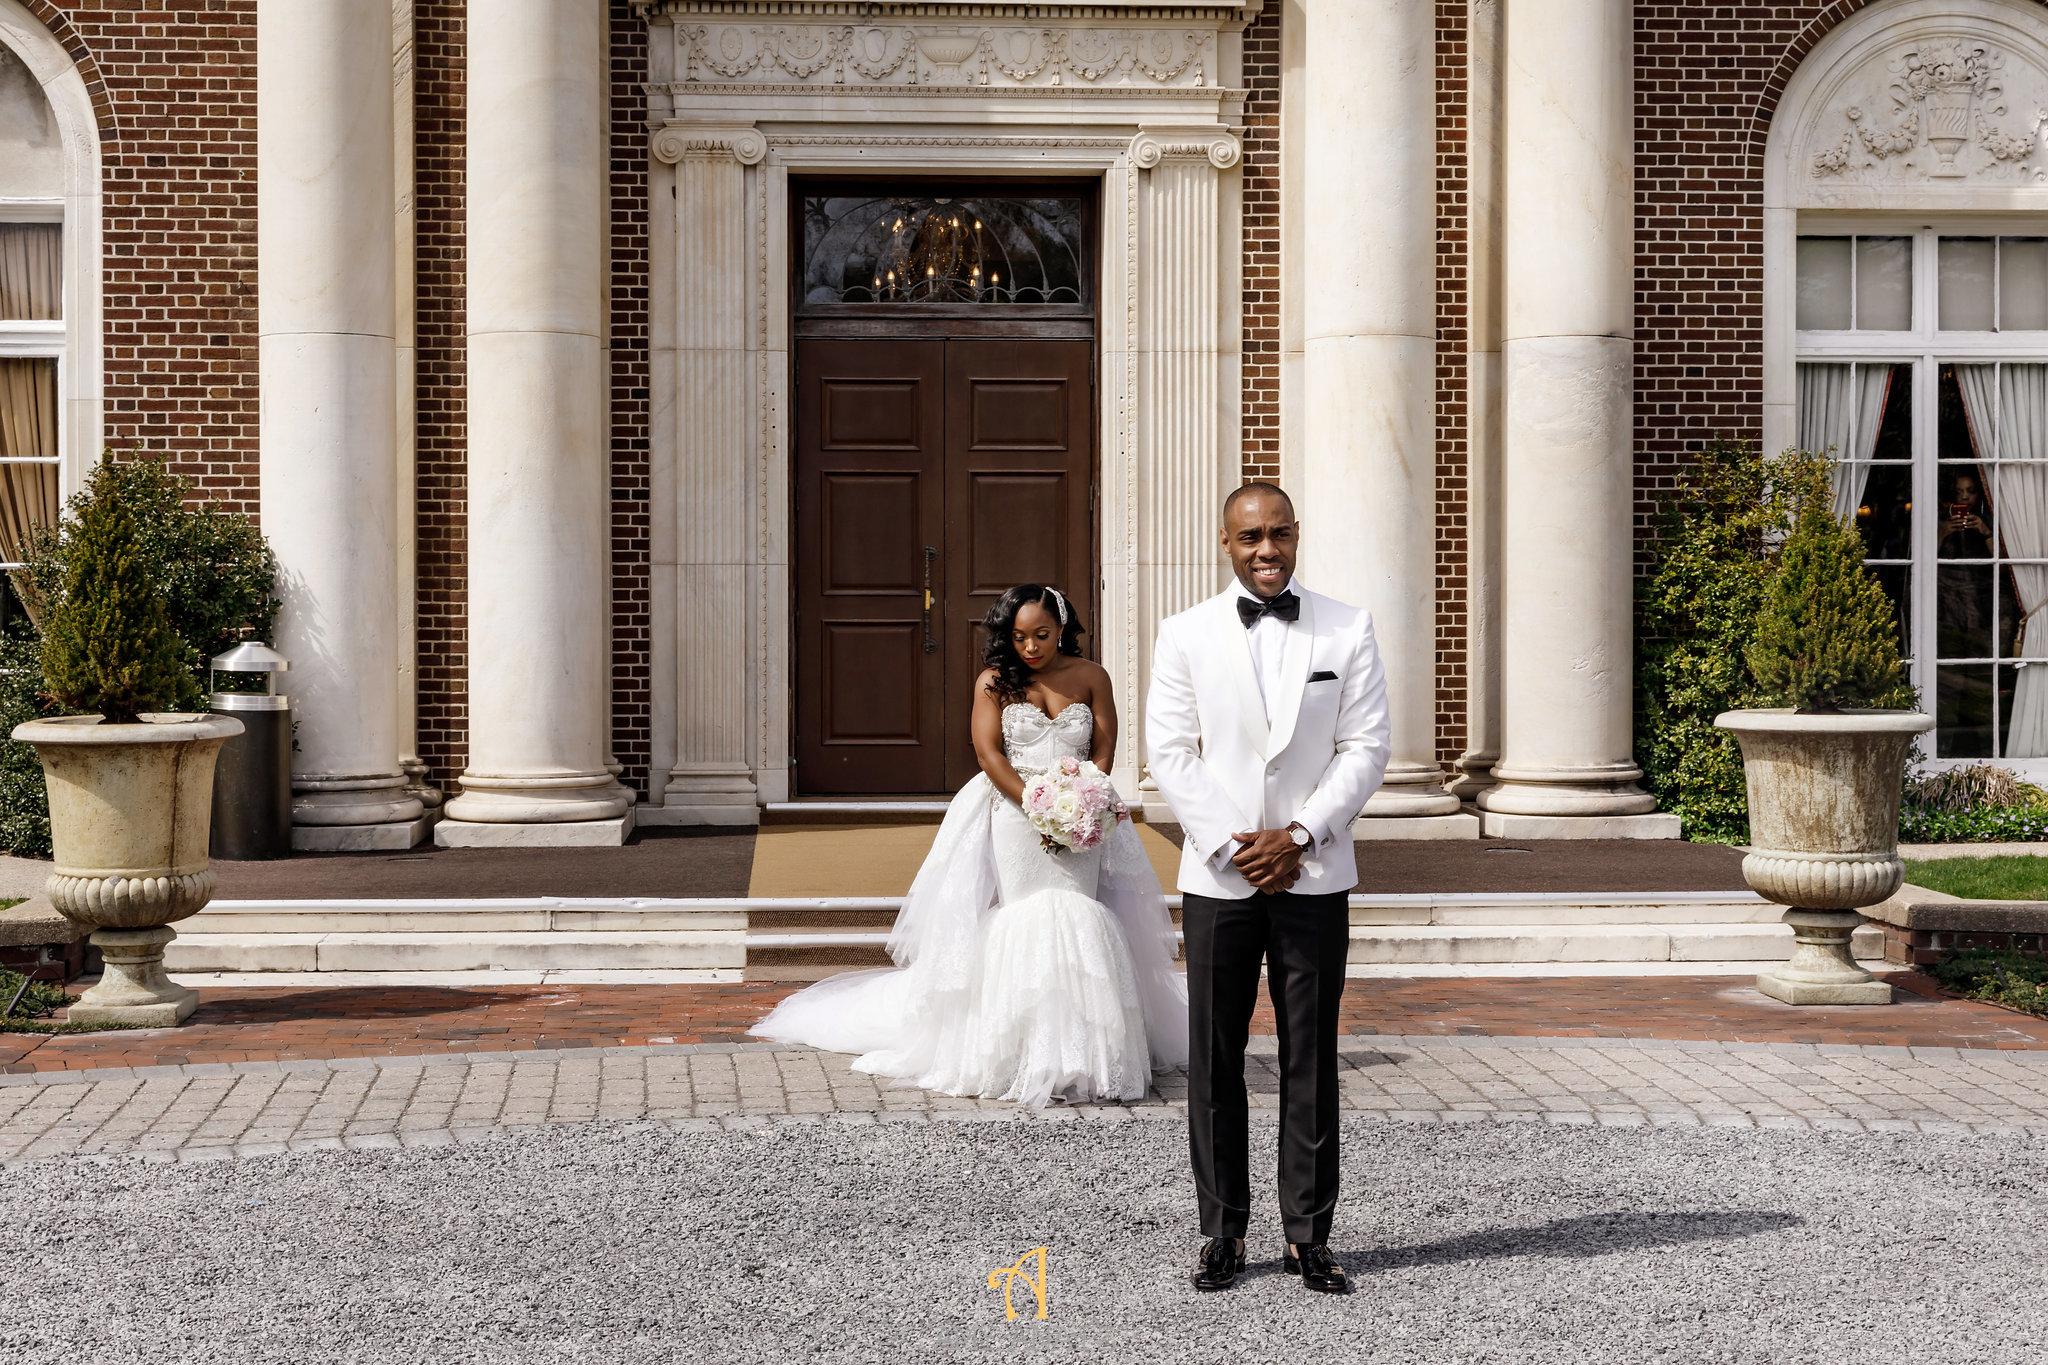 NYIT de Serversky Mansion Wedding, Bridal Gown, Ryan and Walter.JPG